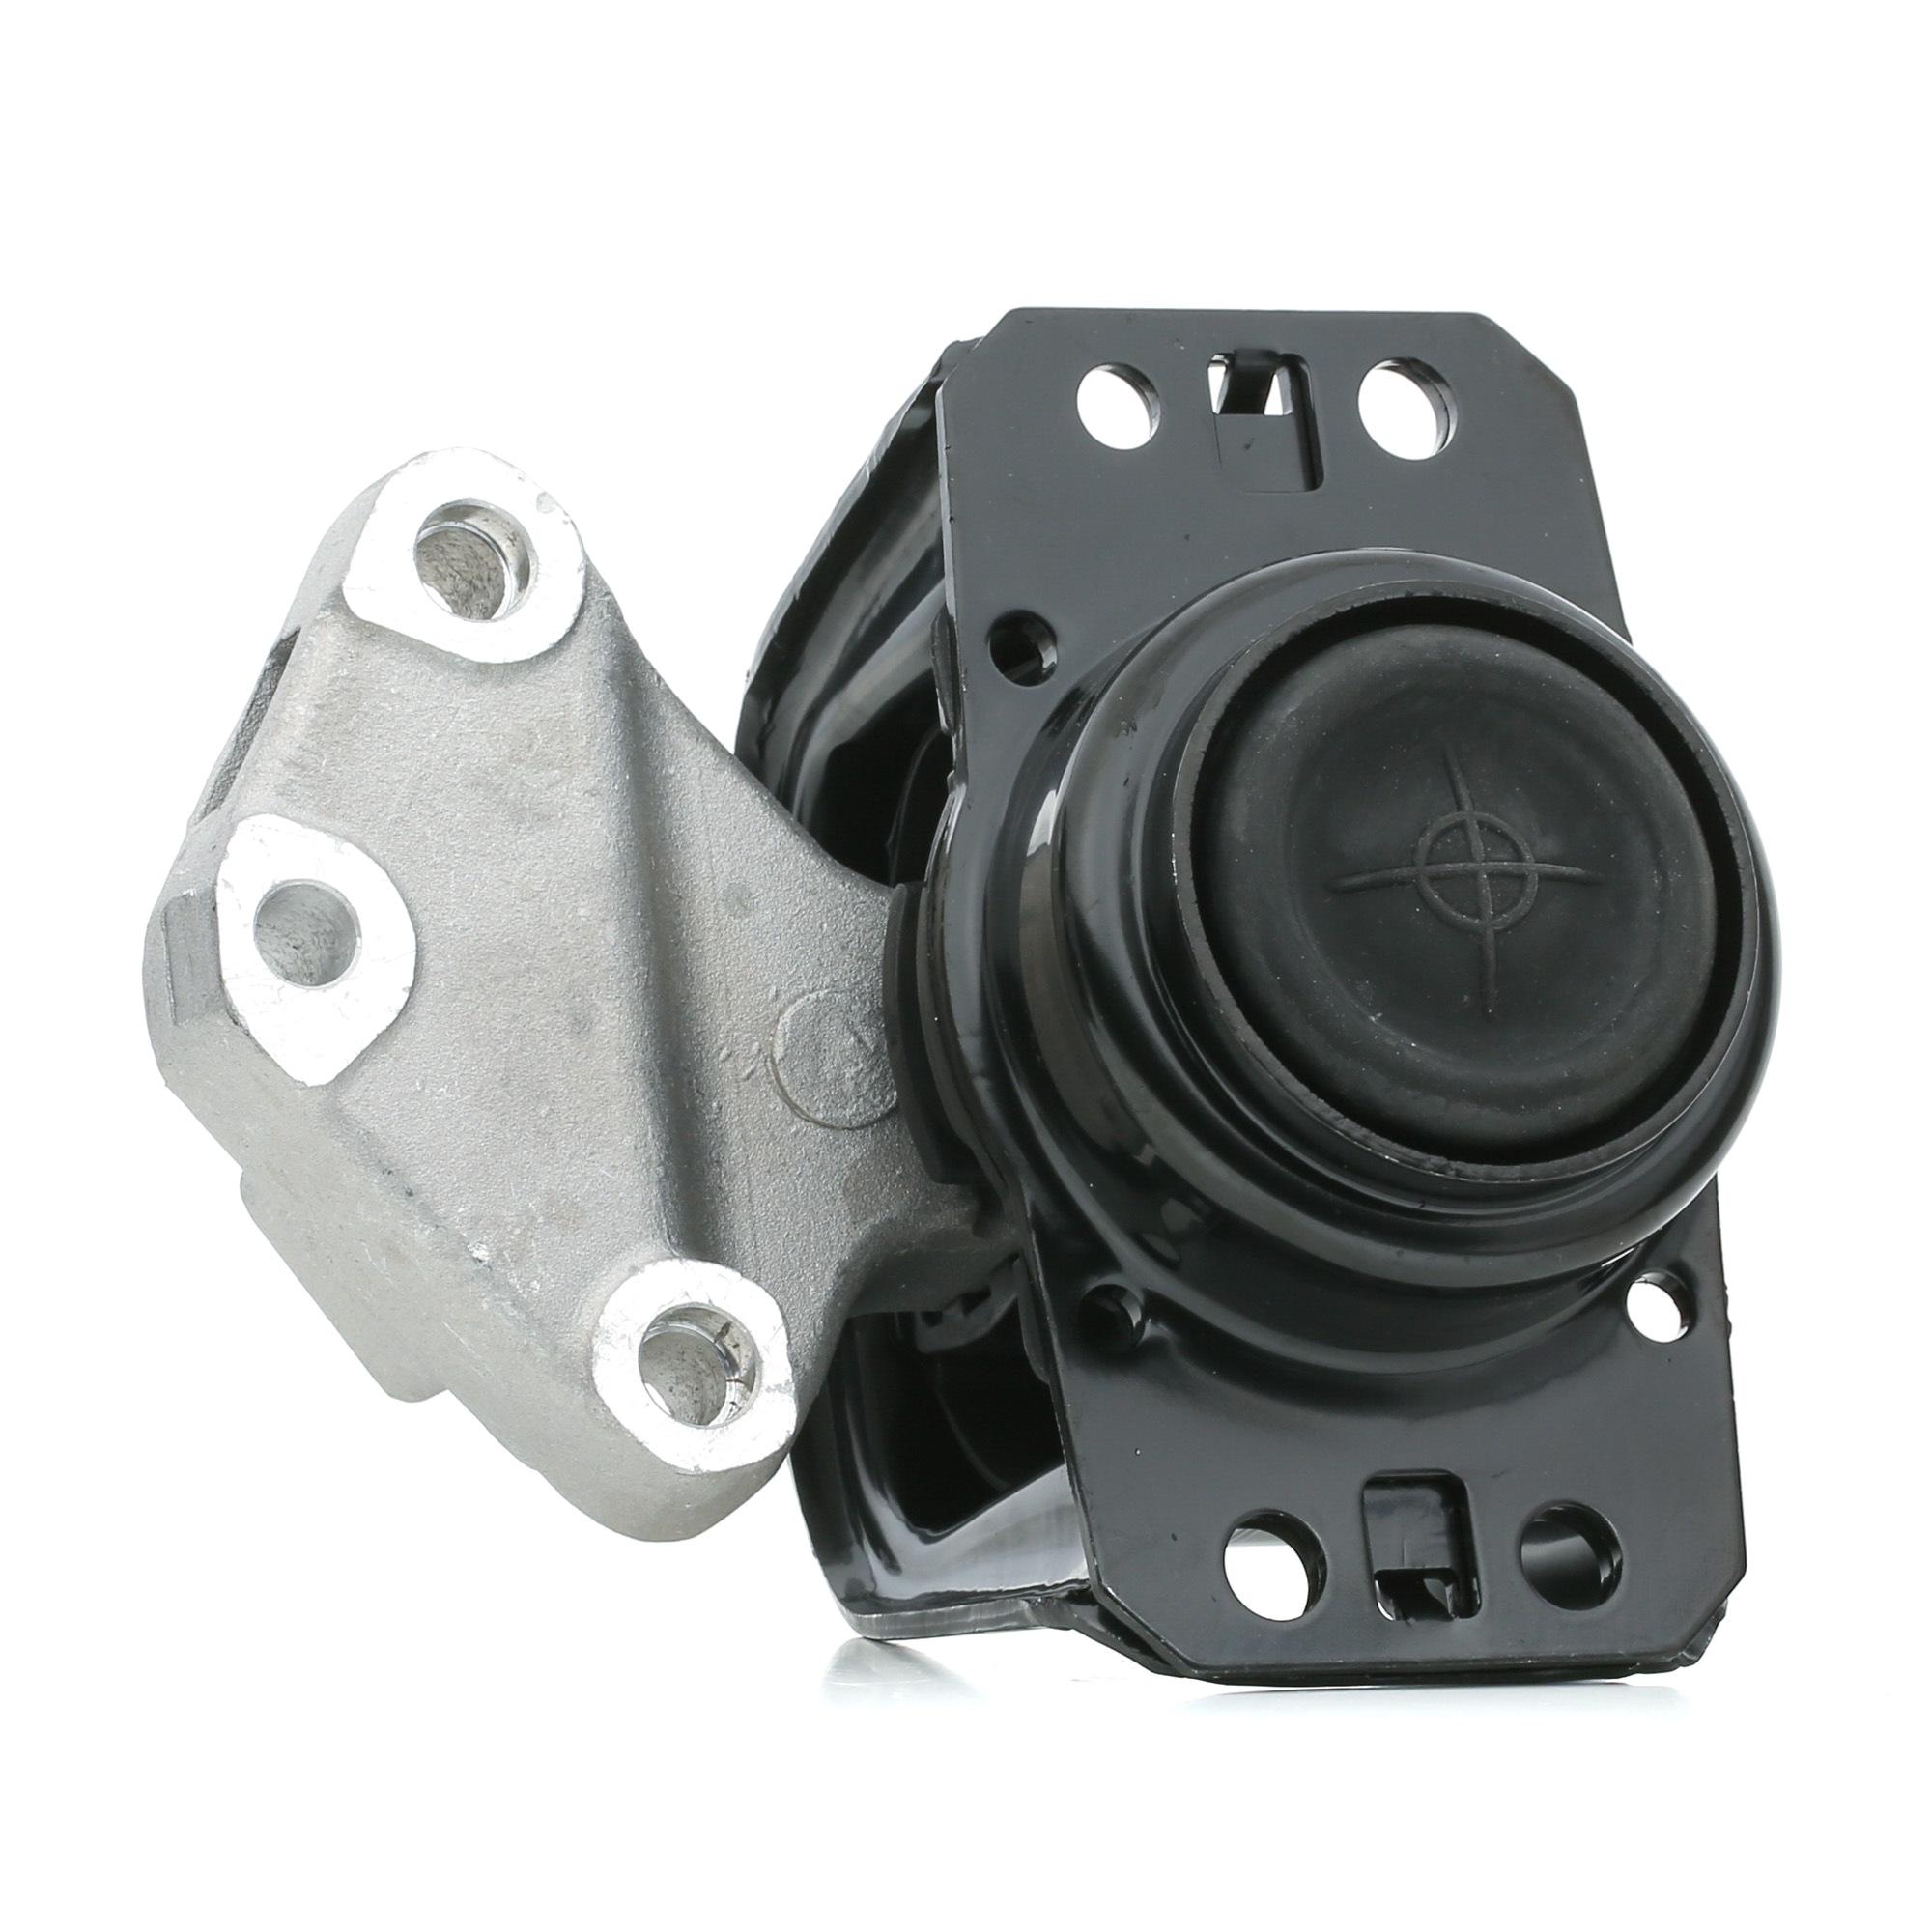 Motor Mount RIDEX 247E0164 rating